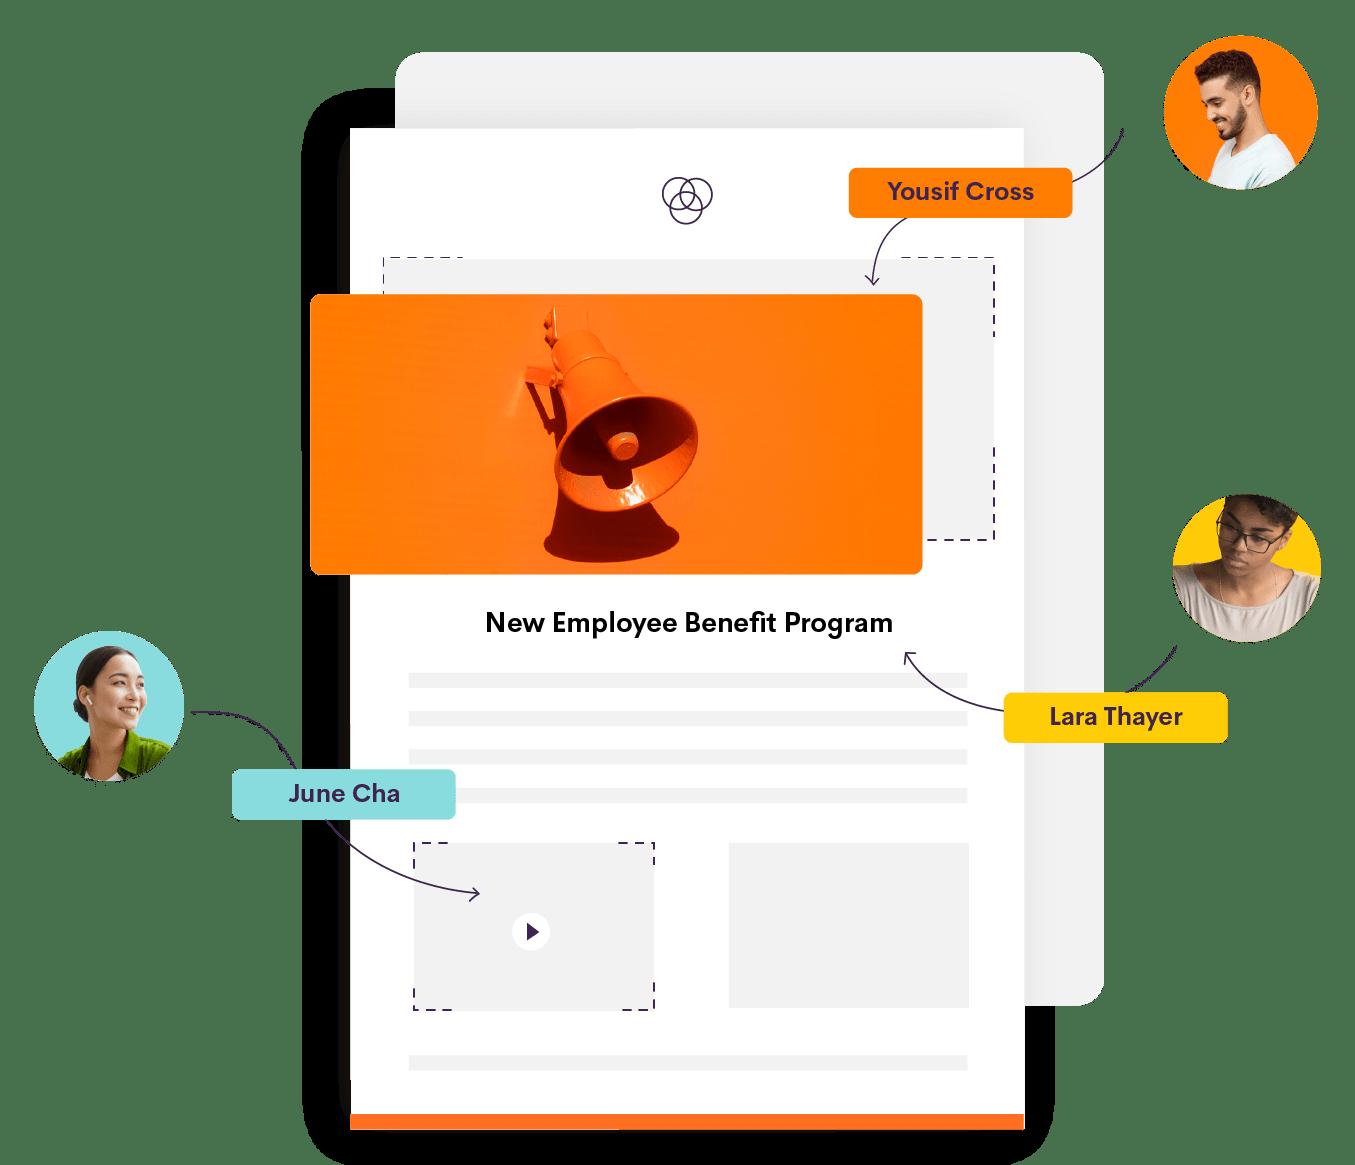 Bananatag Email Designer: Image showing collaboration